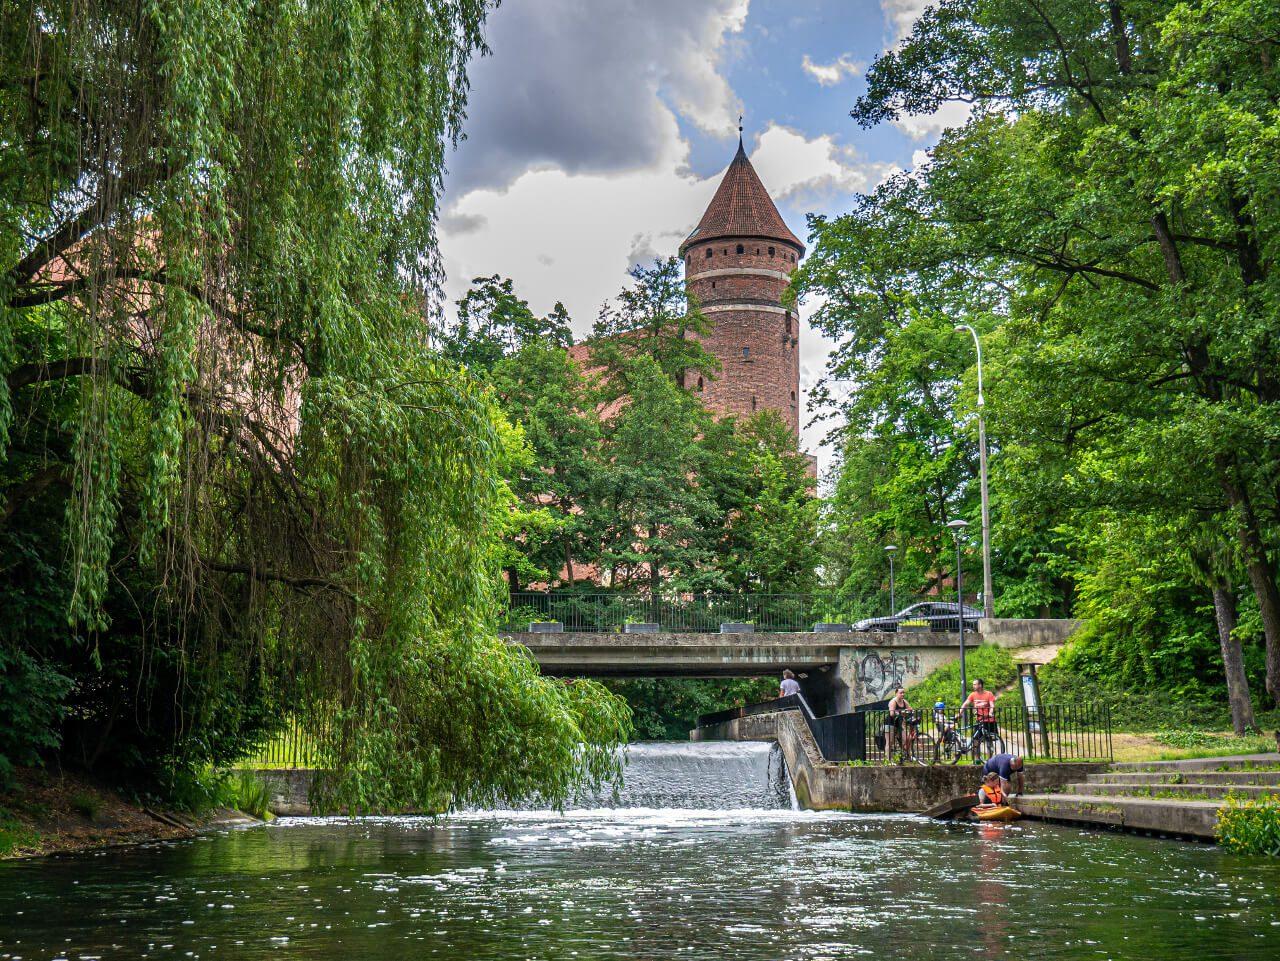 Park Podzamcze Olsztyn Łyna zamek